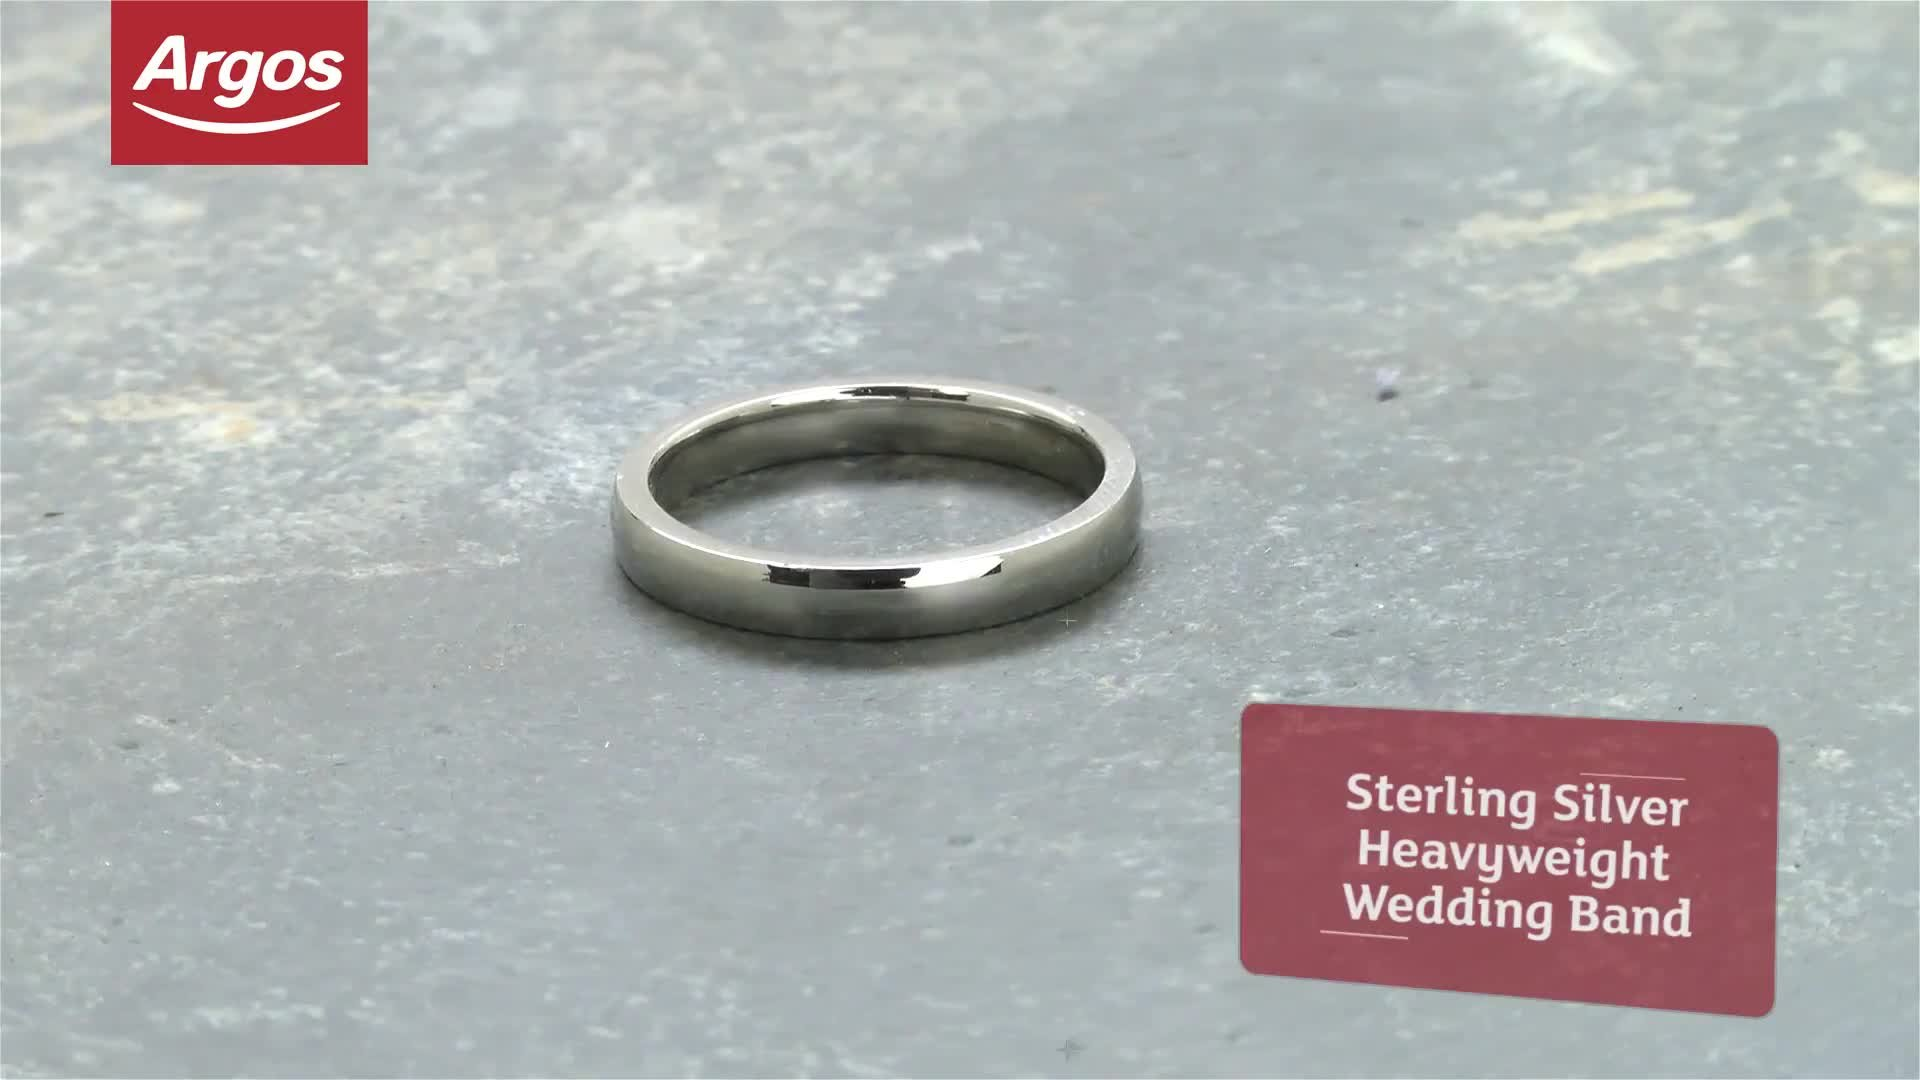 Revere Sterling Silver Heavyweight Wedding Ring - 3mm